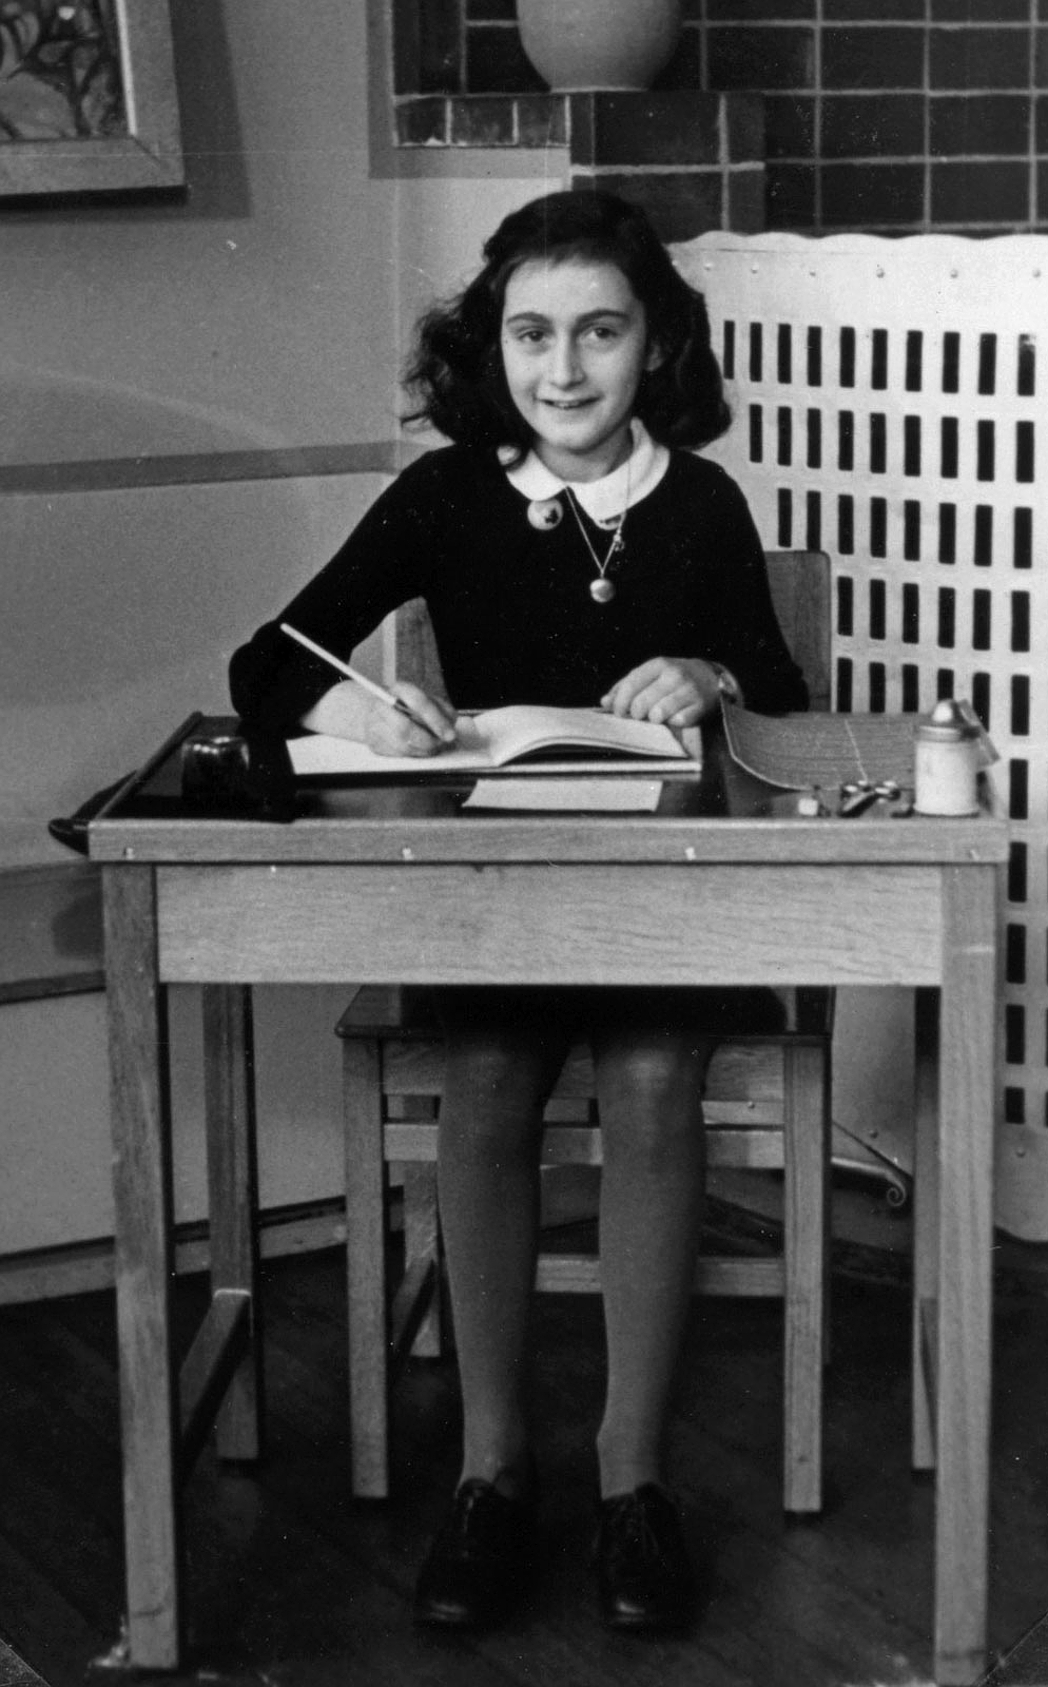 Anne Frank (Source: Wikipedia)